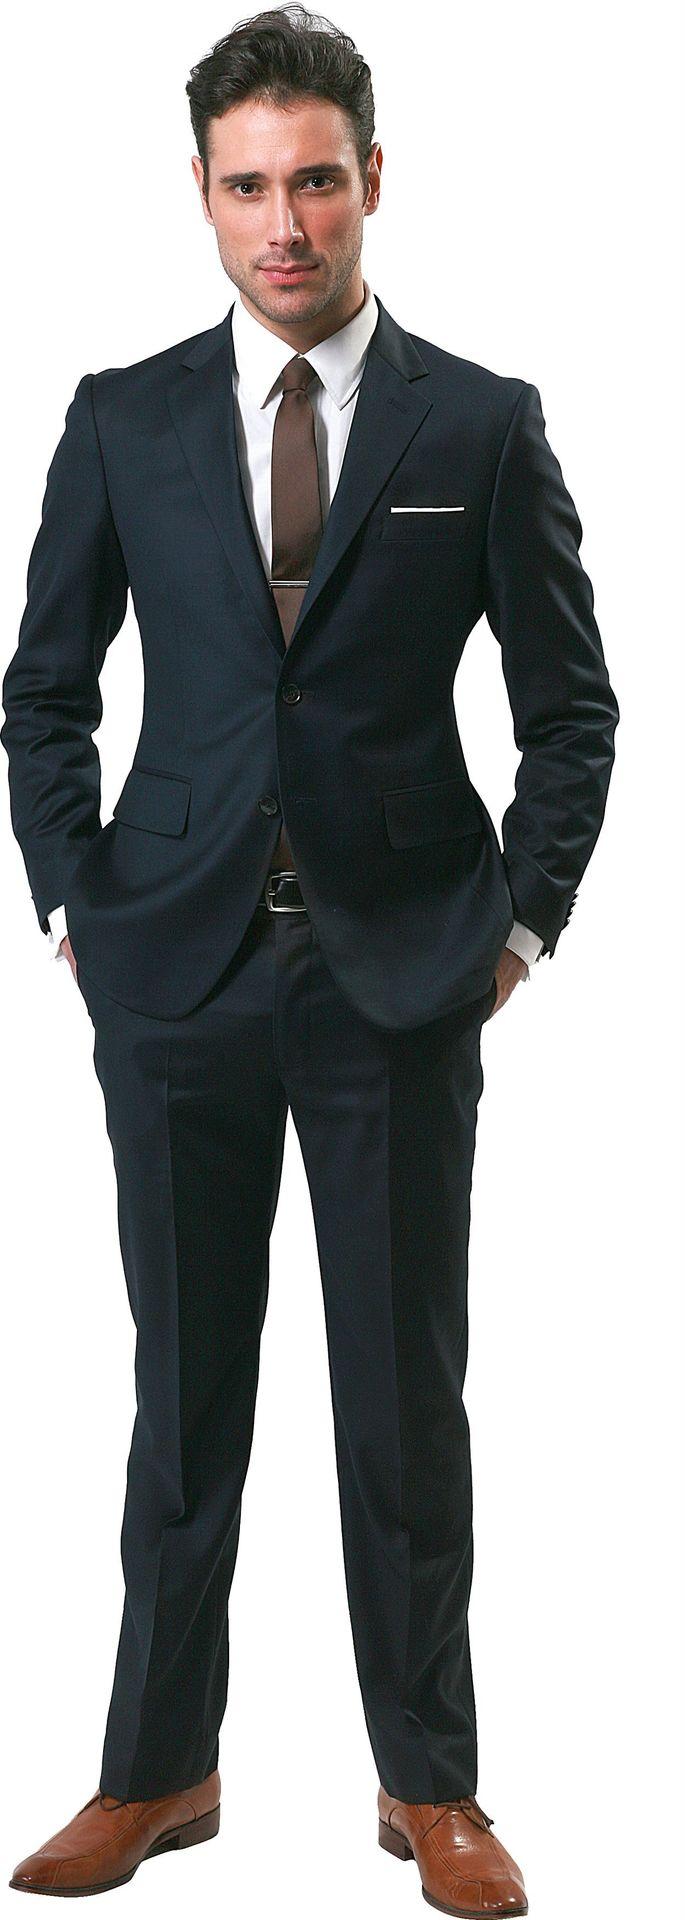 businessman_png6580-business-man